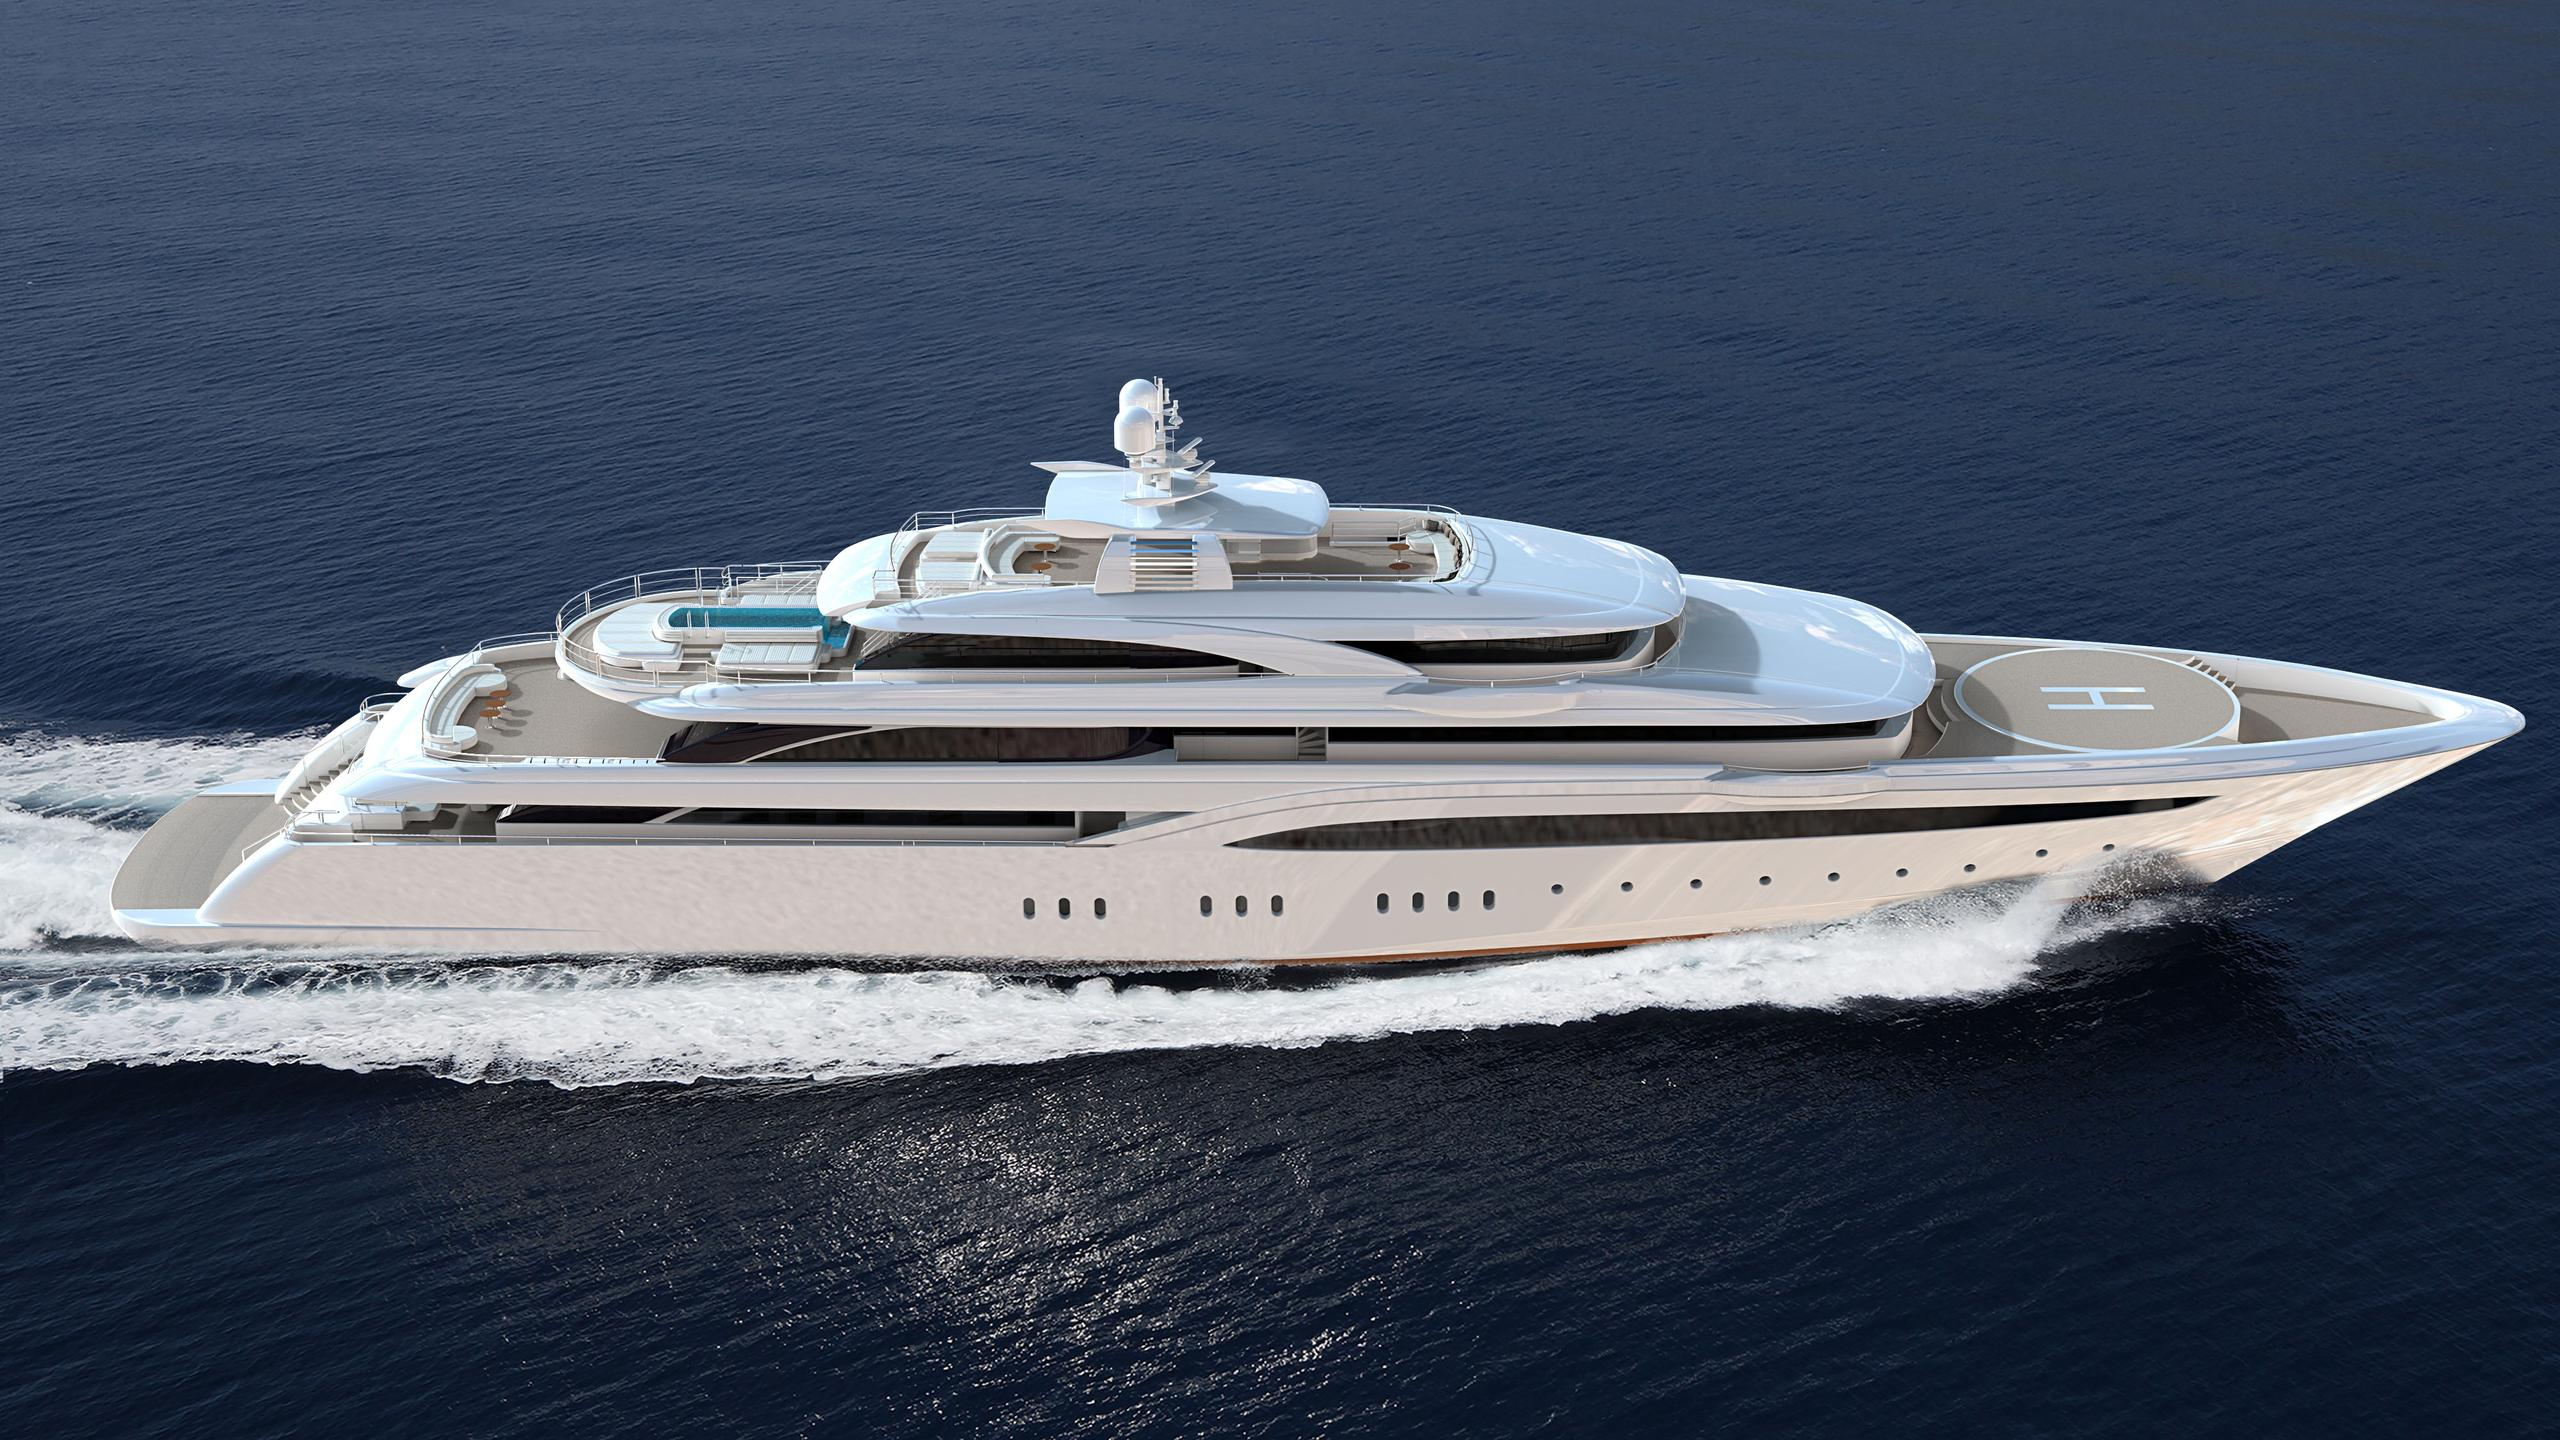 optasia gy85 motoryacht golden yachts 85m 2018 rendering